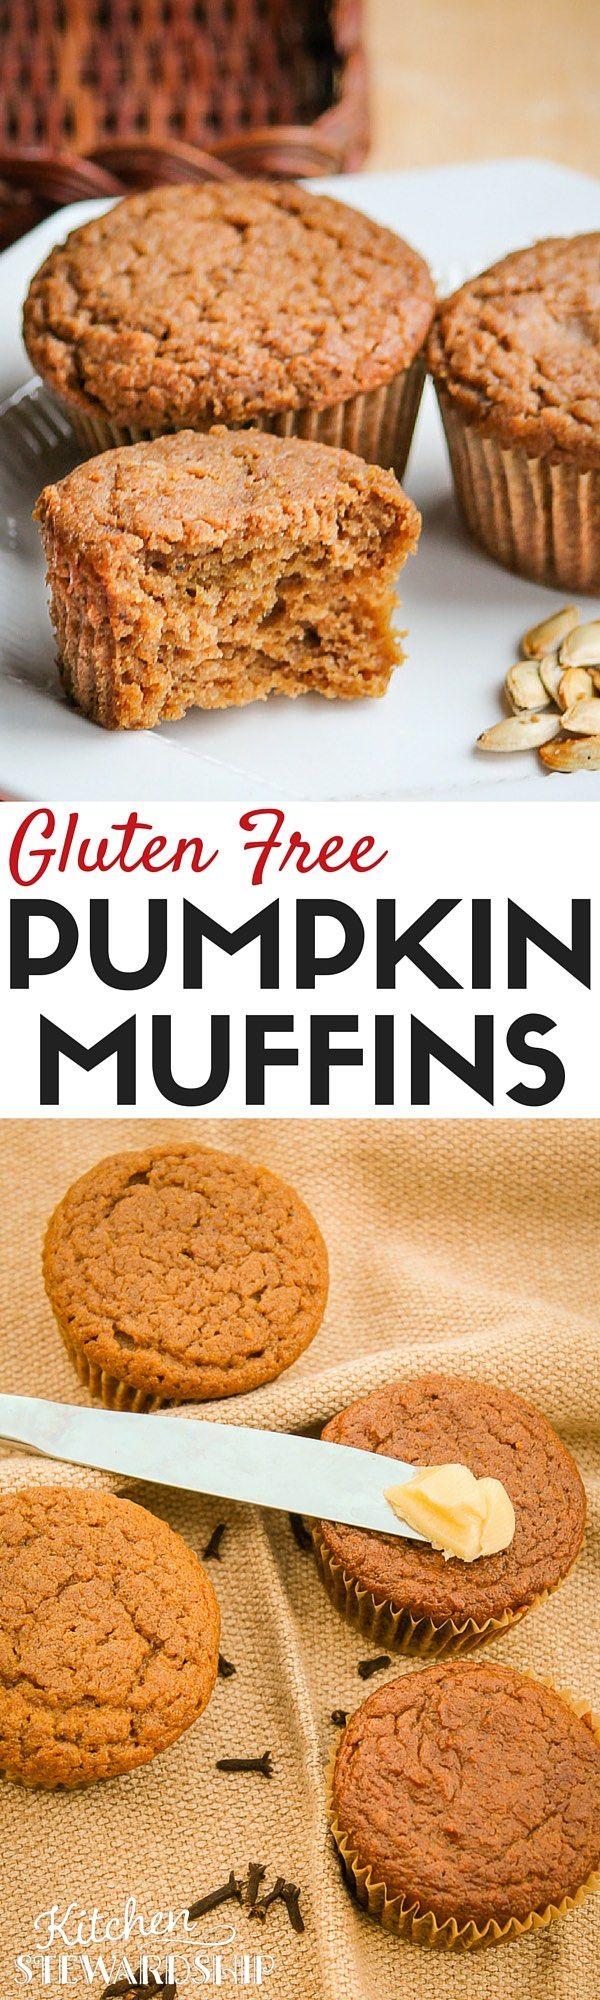 Easy Gluten-free One-Bowl Pumpkin Muffins (also egg-free, dairy-free, nut-free…